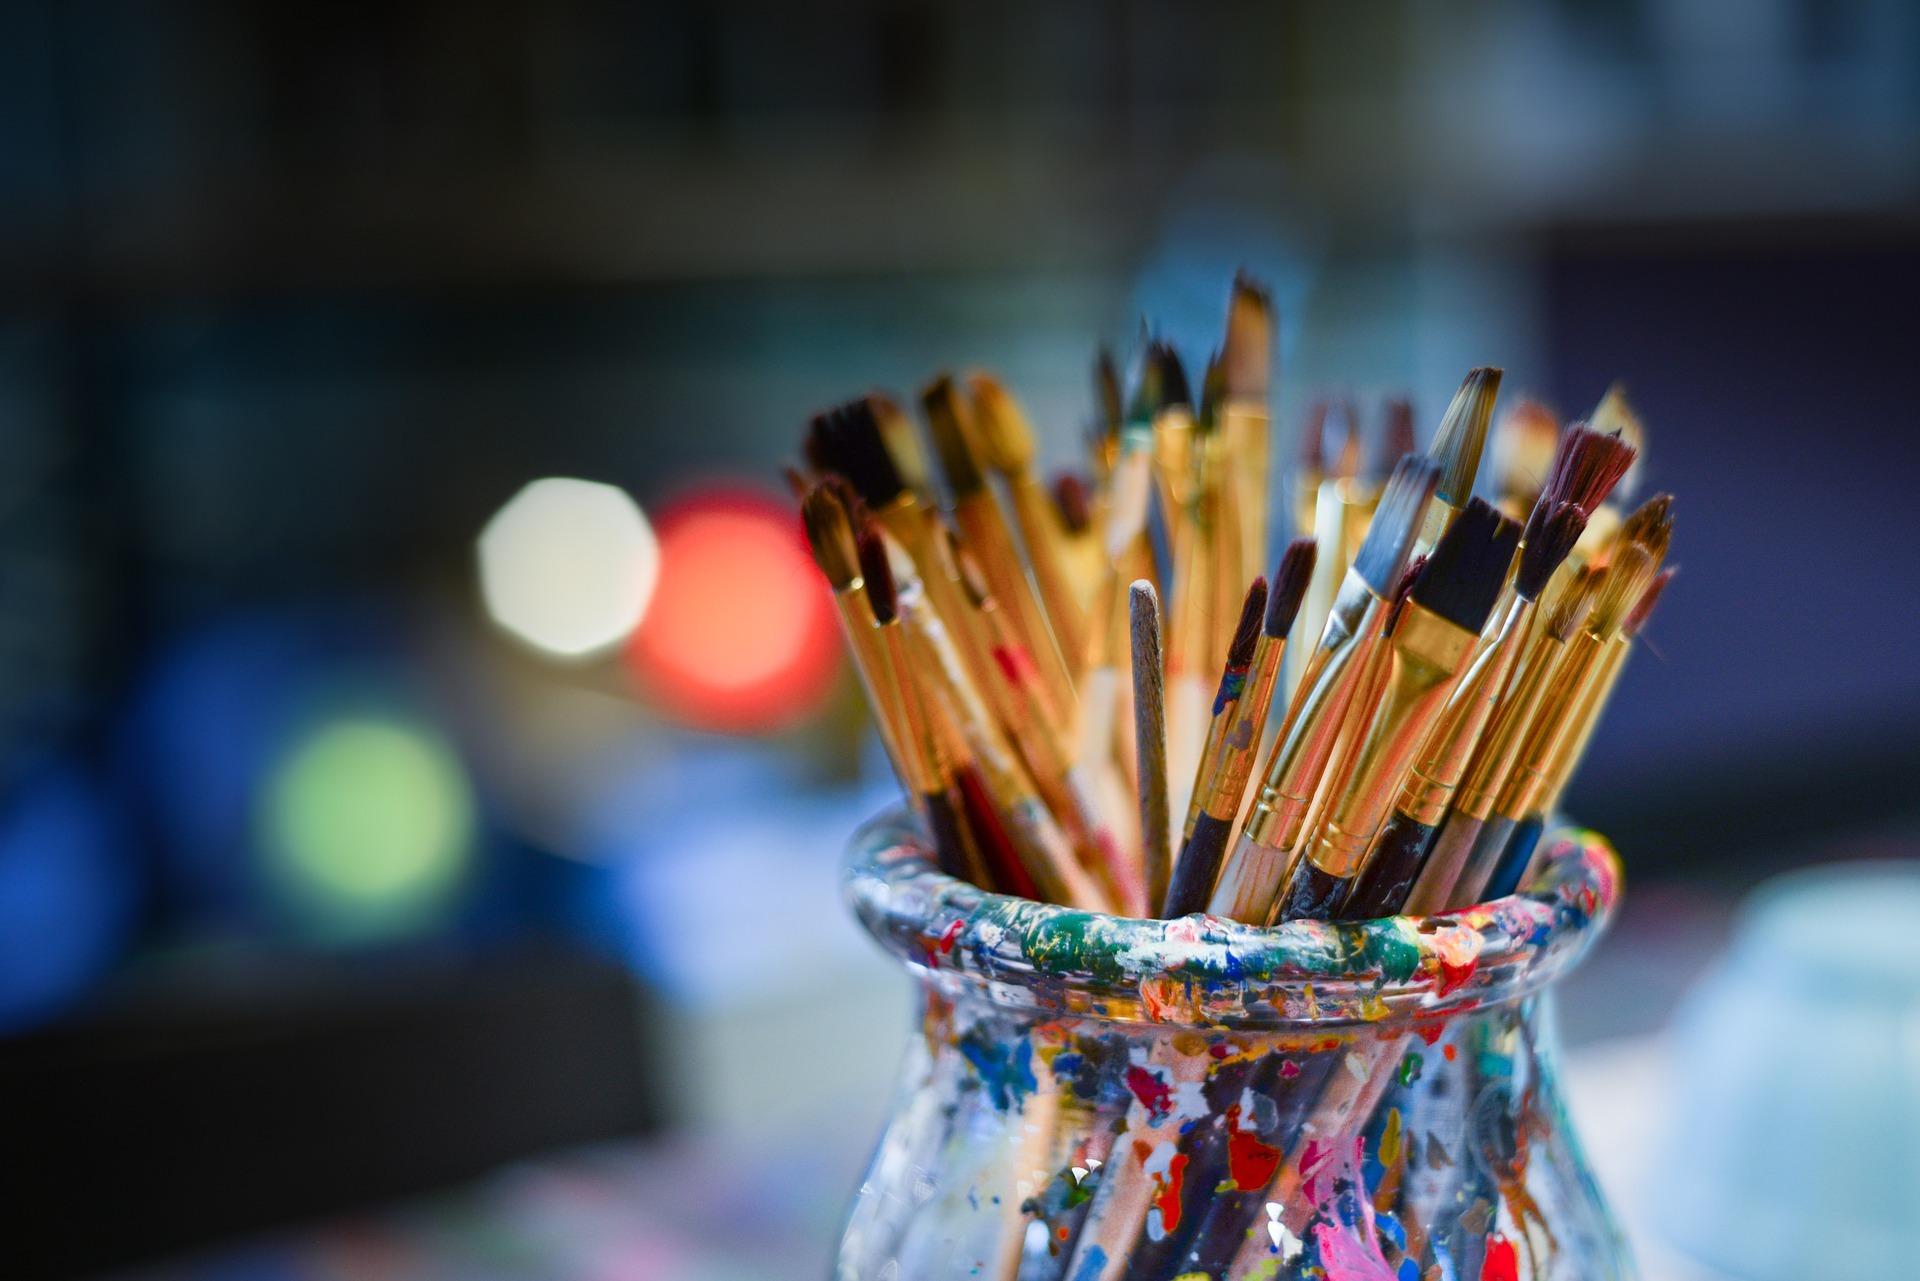 itineraires-d-artistes-pixabay